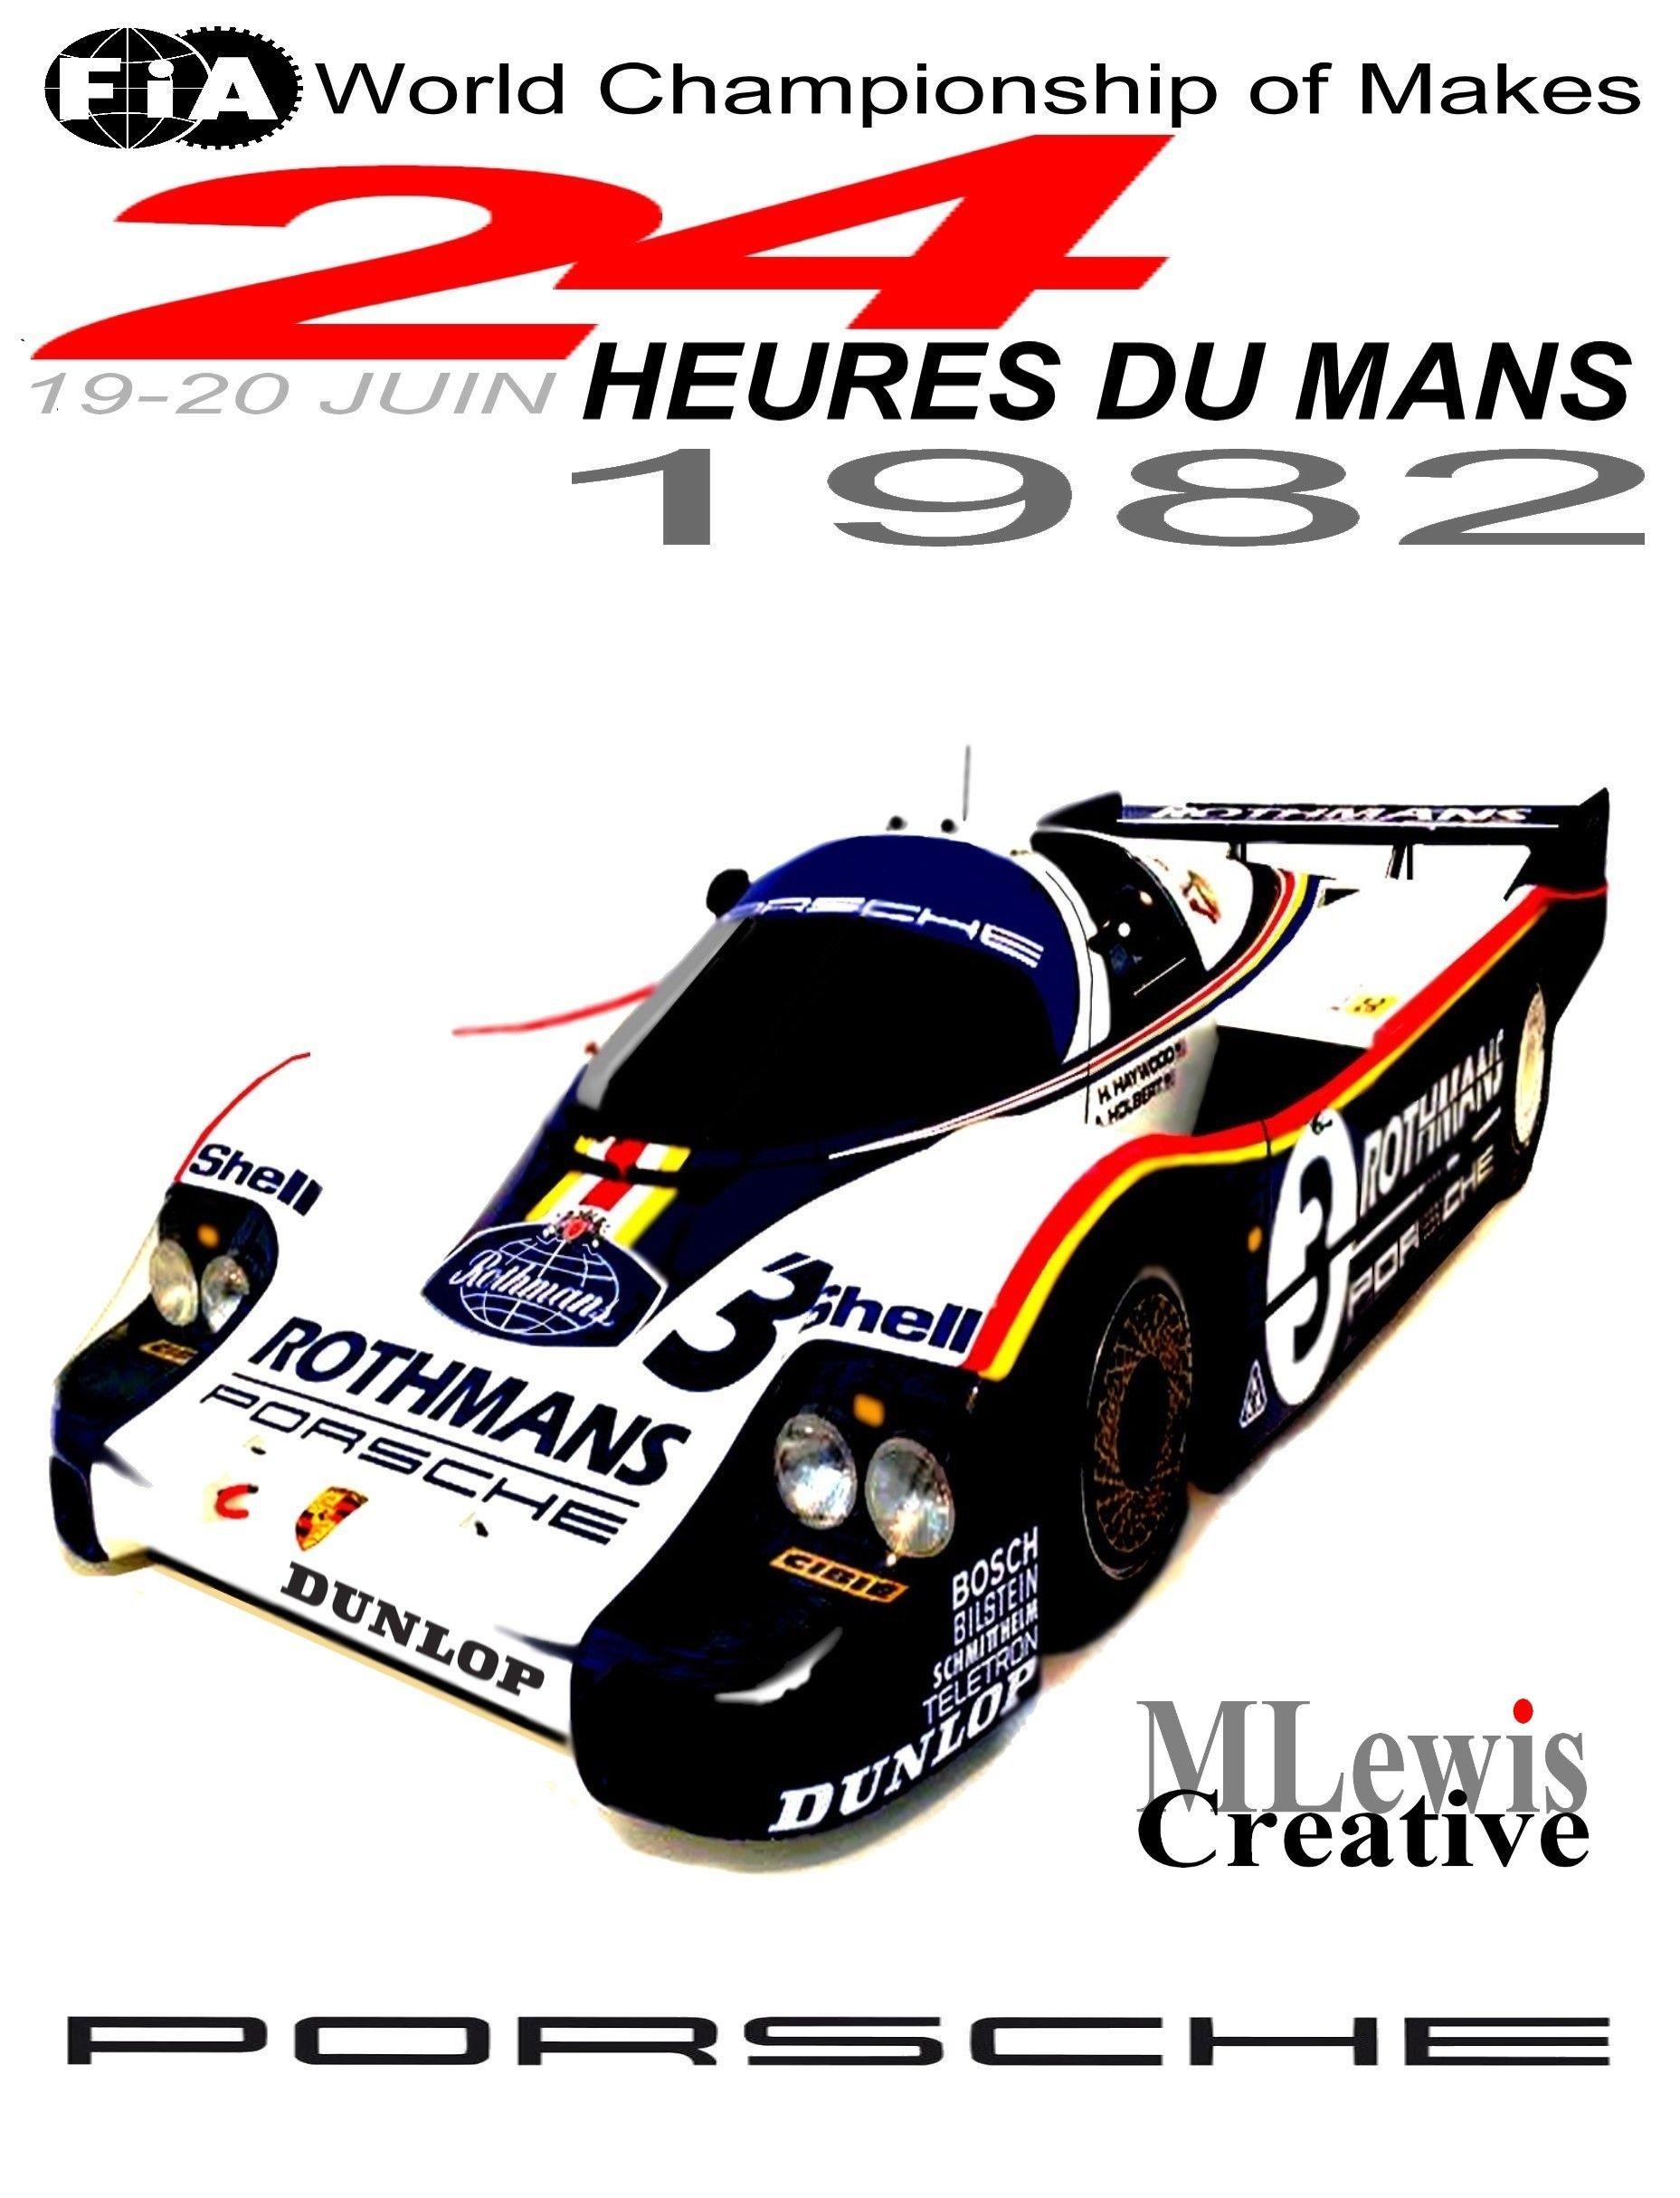 retro le mans 1982 poster by mlewis creative mlewis motorsports art pinterest le mans. Black Bedroom Furniture Sets. Home Design Ideas